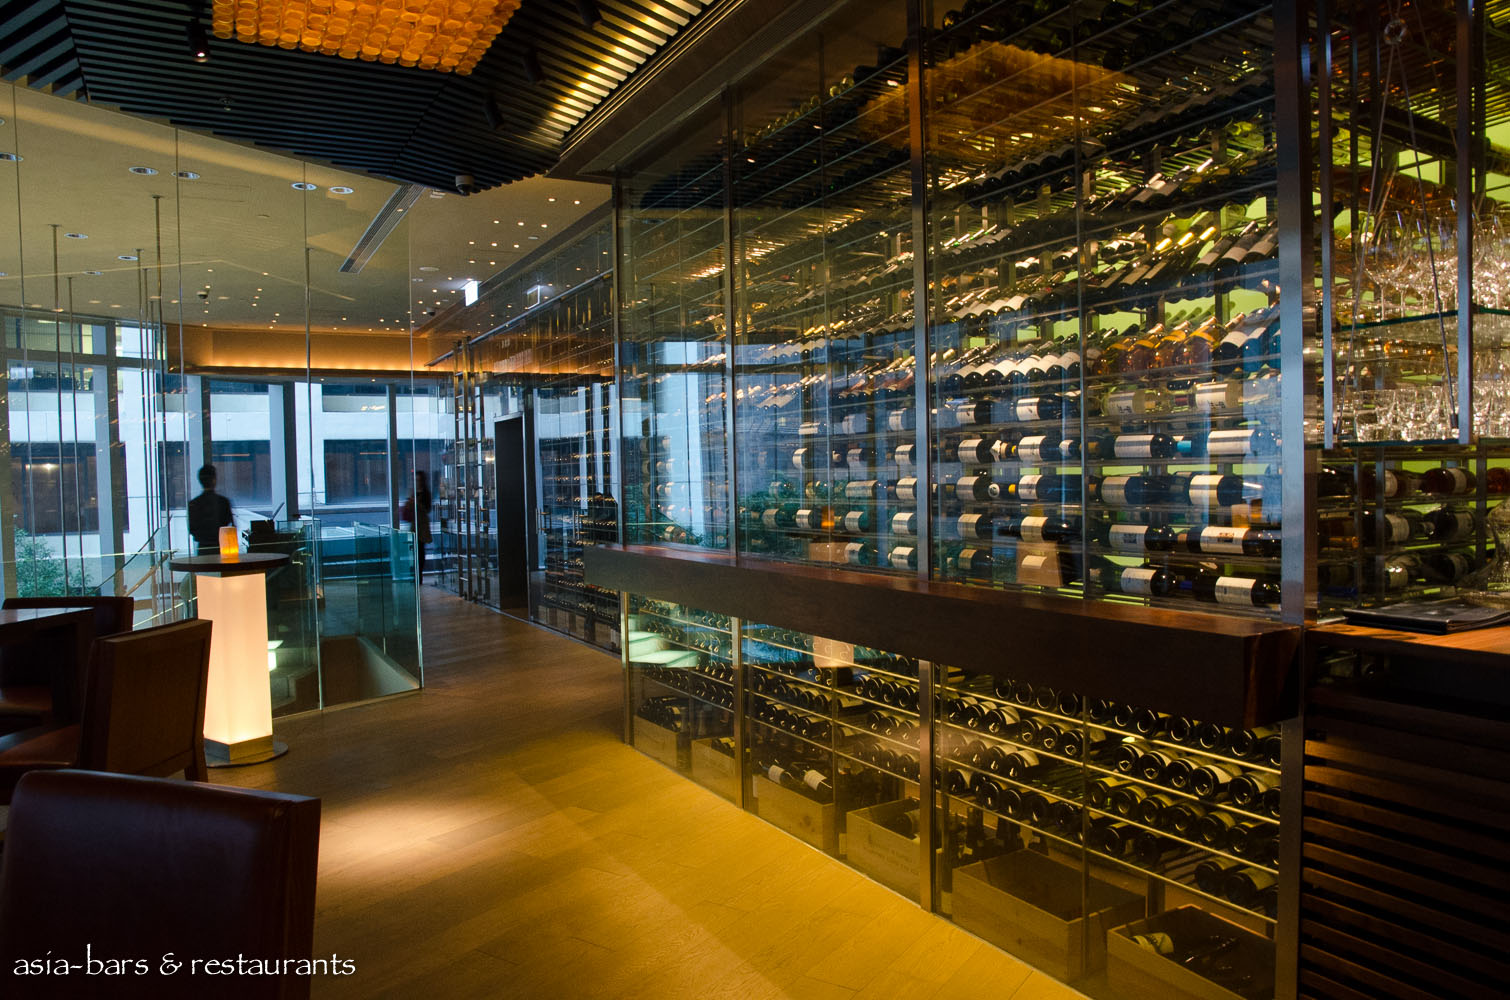 Wine Cellar Homantin Hong Kong Gallery Focus Cellars & Wine Cellar Hong Kong - Vase and Cellar Image Avorcor.Com